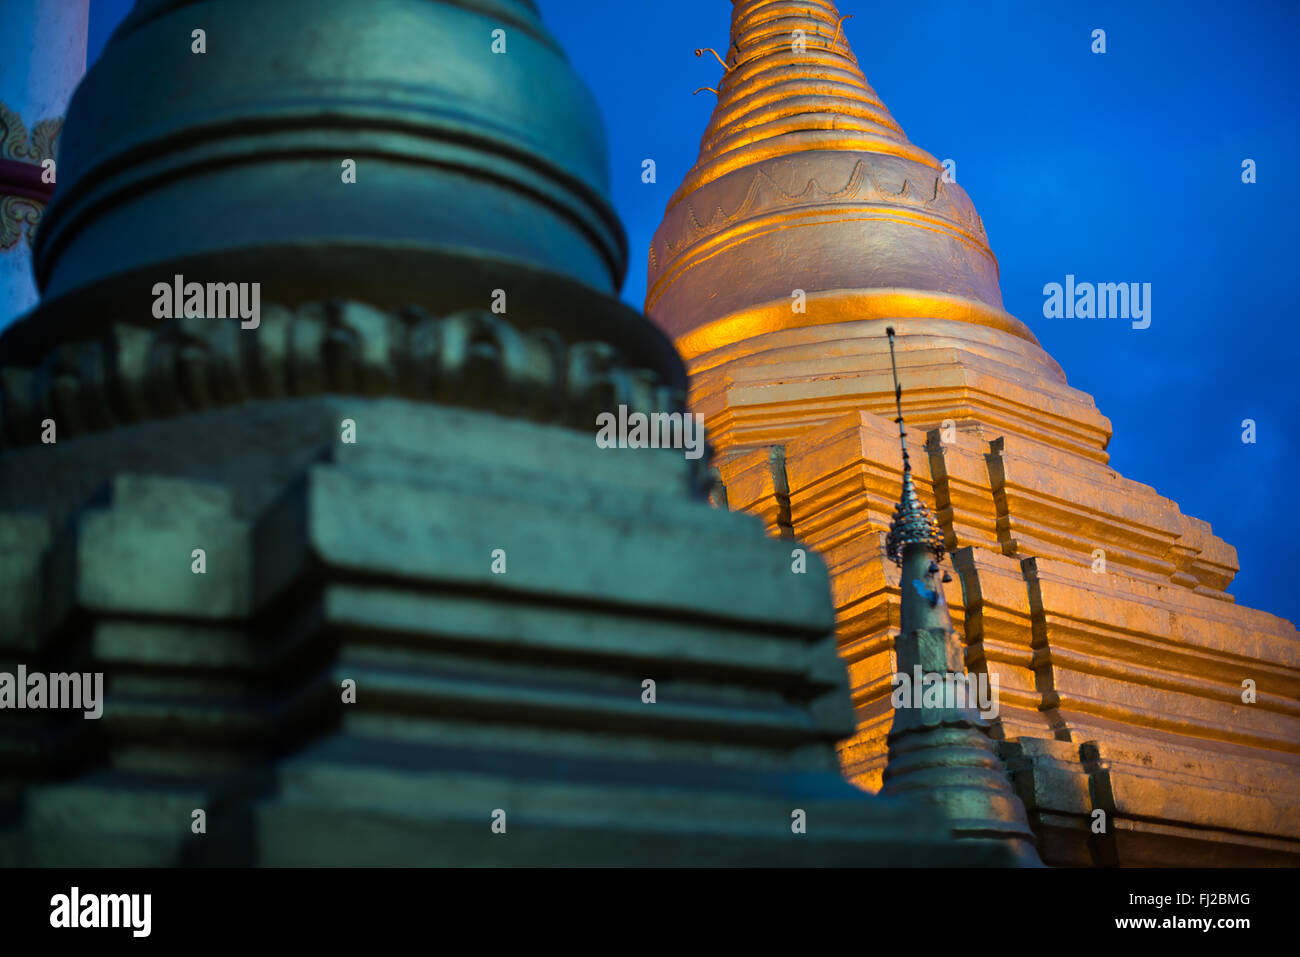 MANDALAY, Myanmar - Sitting on top of Mandalay Hill, Sutaungpyei Pagoda features a large ornately decorate patio - Stock Image